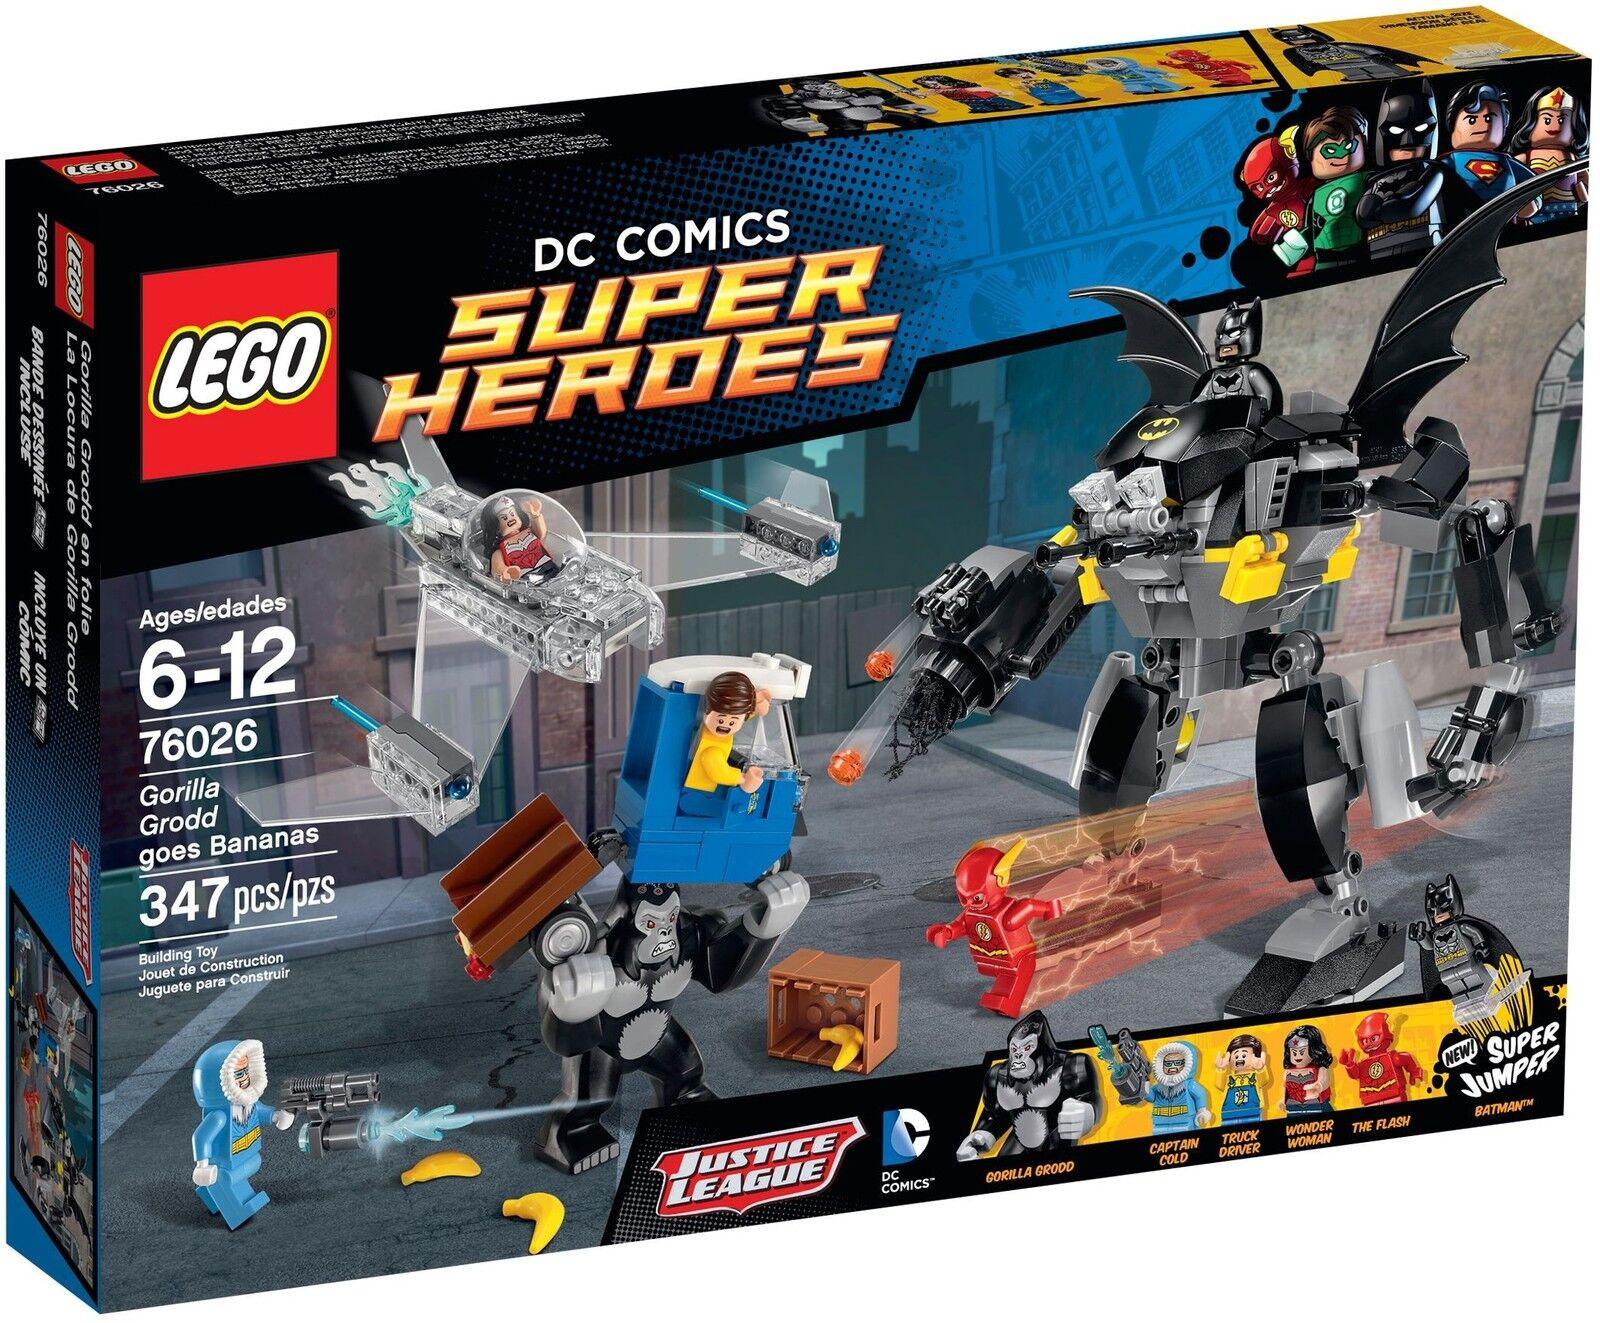 LEGO DC super Heroes - 76026 gorille grodds crise de rage avec Batman-NEUF & OVP